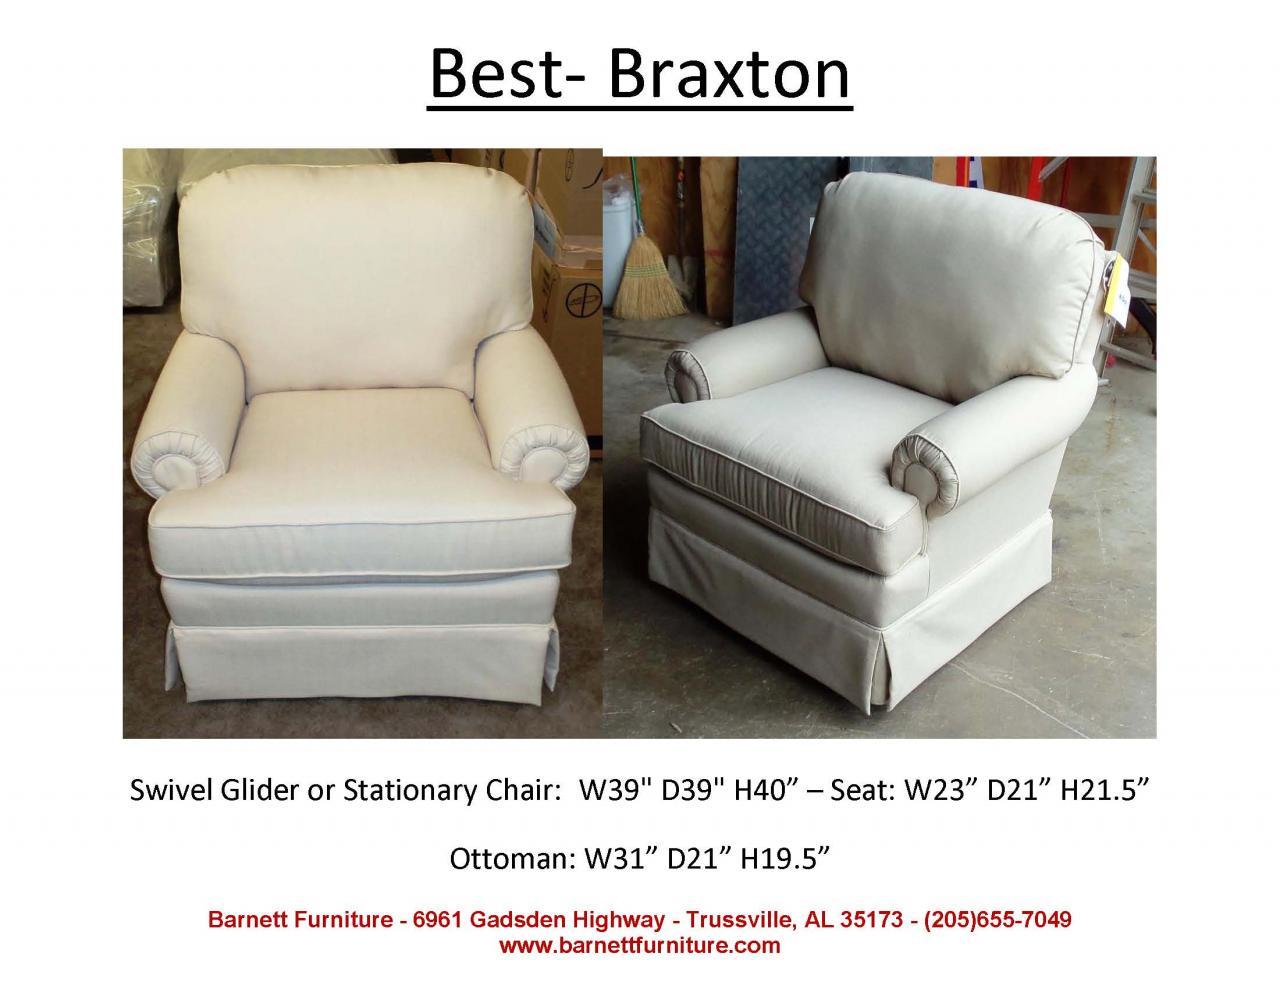 best chairs swivel glider recliner swing chair usa barnett furniture gliders braxton